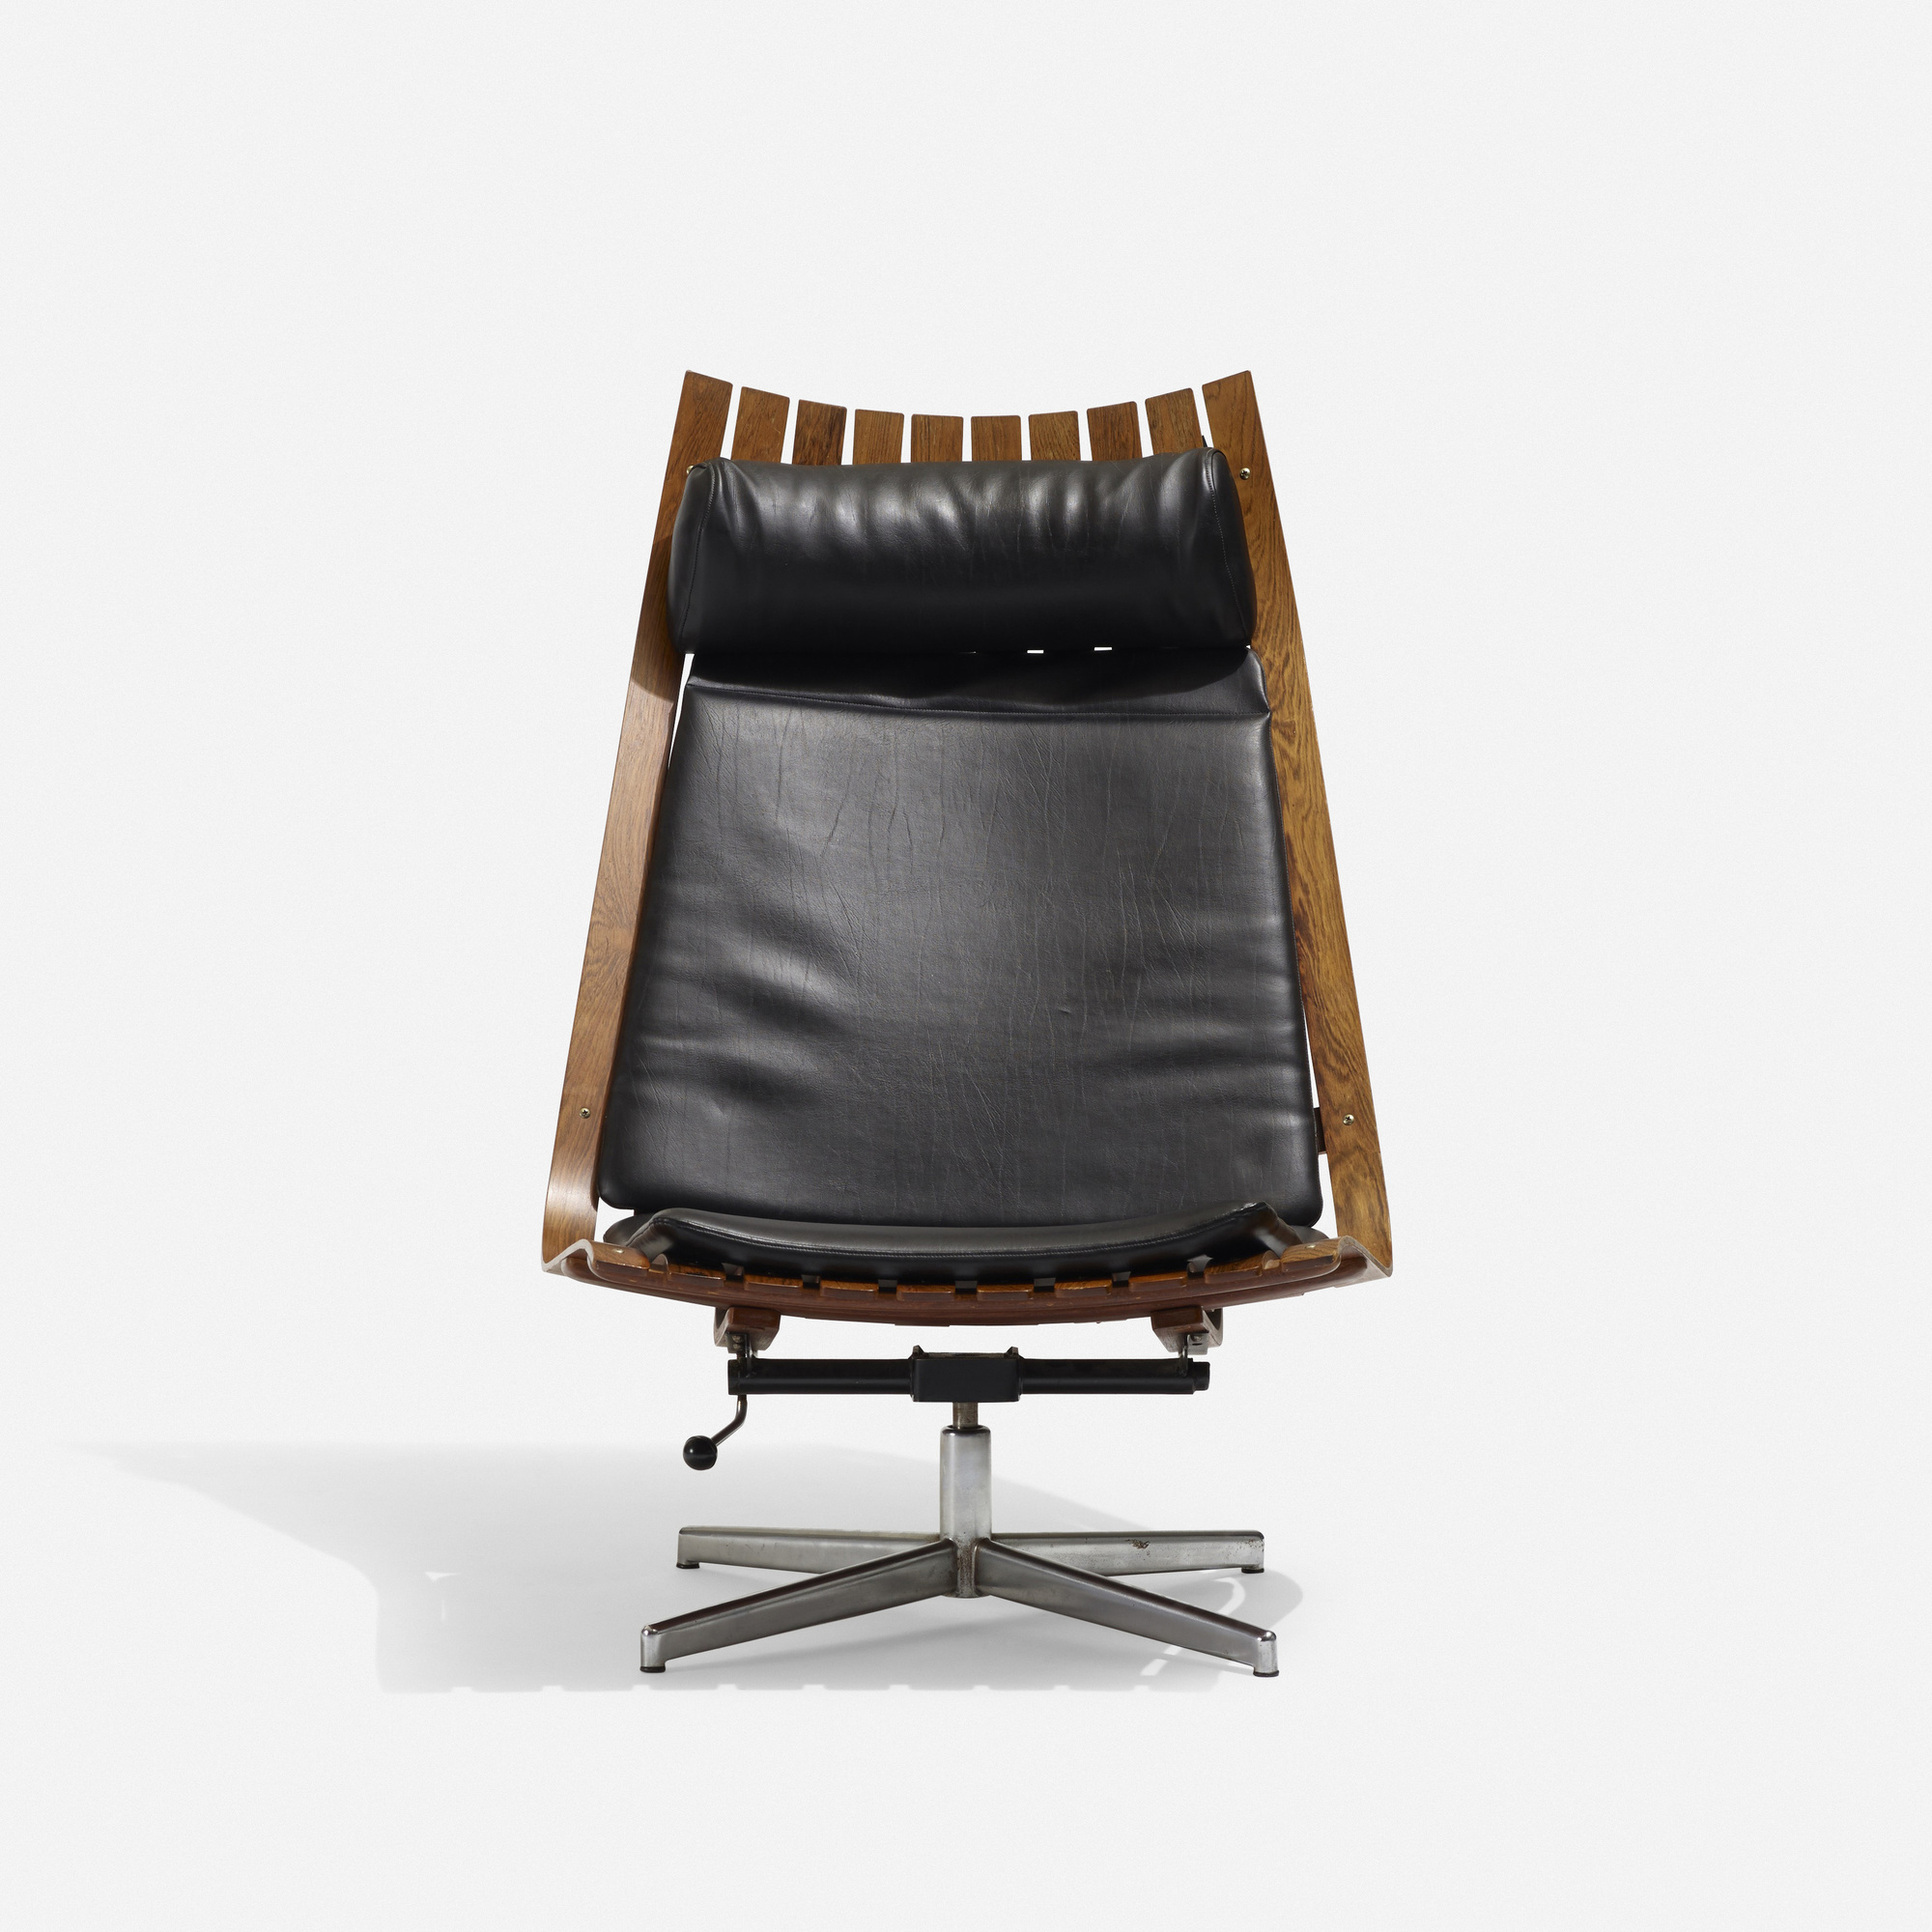 Astonishing 217 Hans Brattrud Scandia Nett Swivel Lounge Chair Ibusinesslaw Wood Chair Design Ideas Ibusinesslaworg